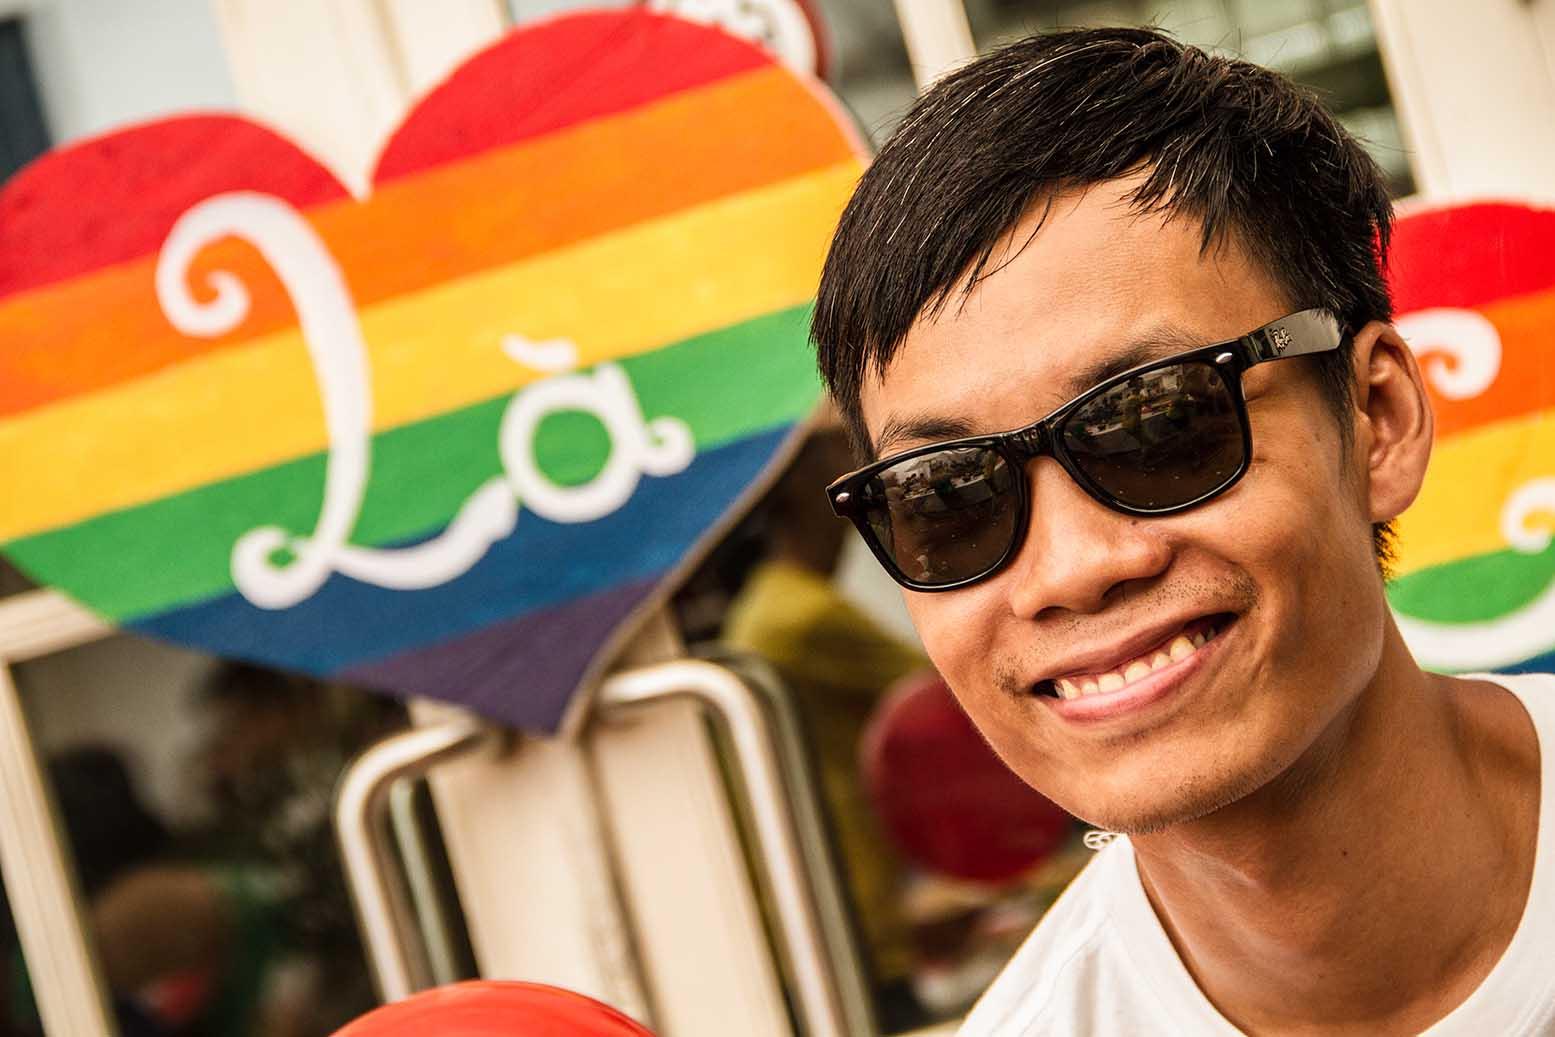 Viet Pride Archives - Etherium Sky   Worldwide Film, TV, Video & Media  Production